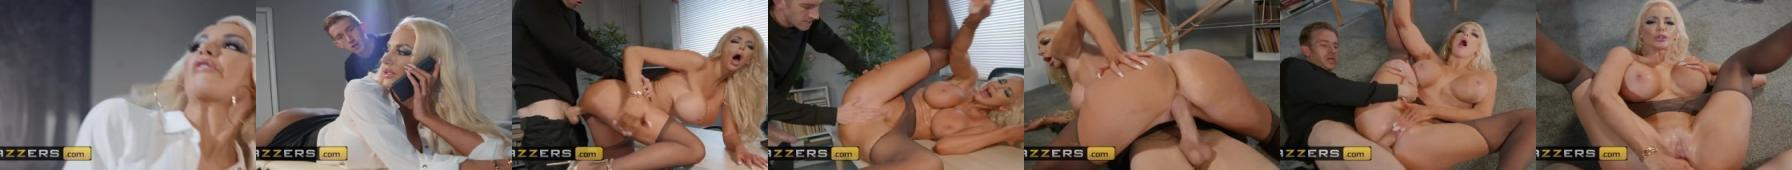 Filmy porno z Nicolette Shea